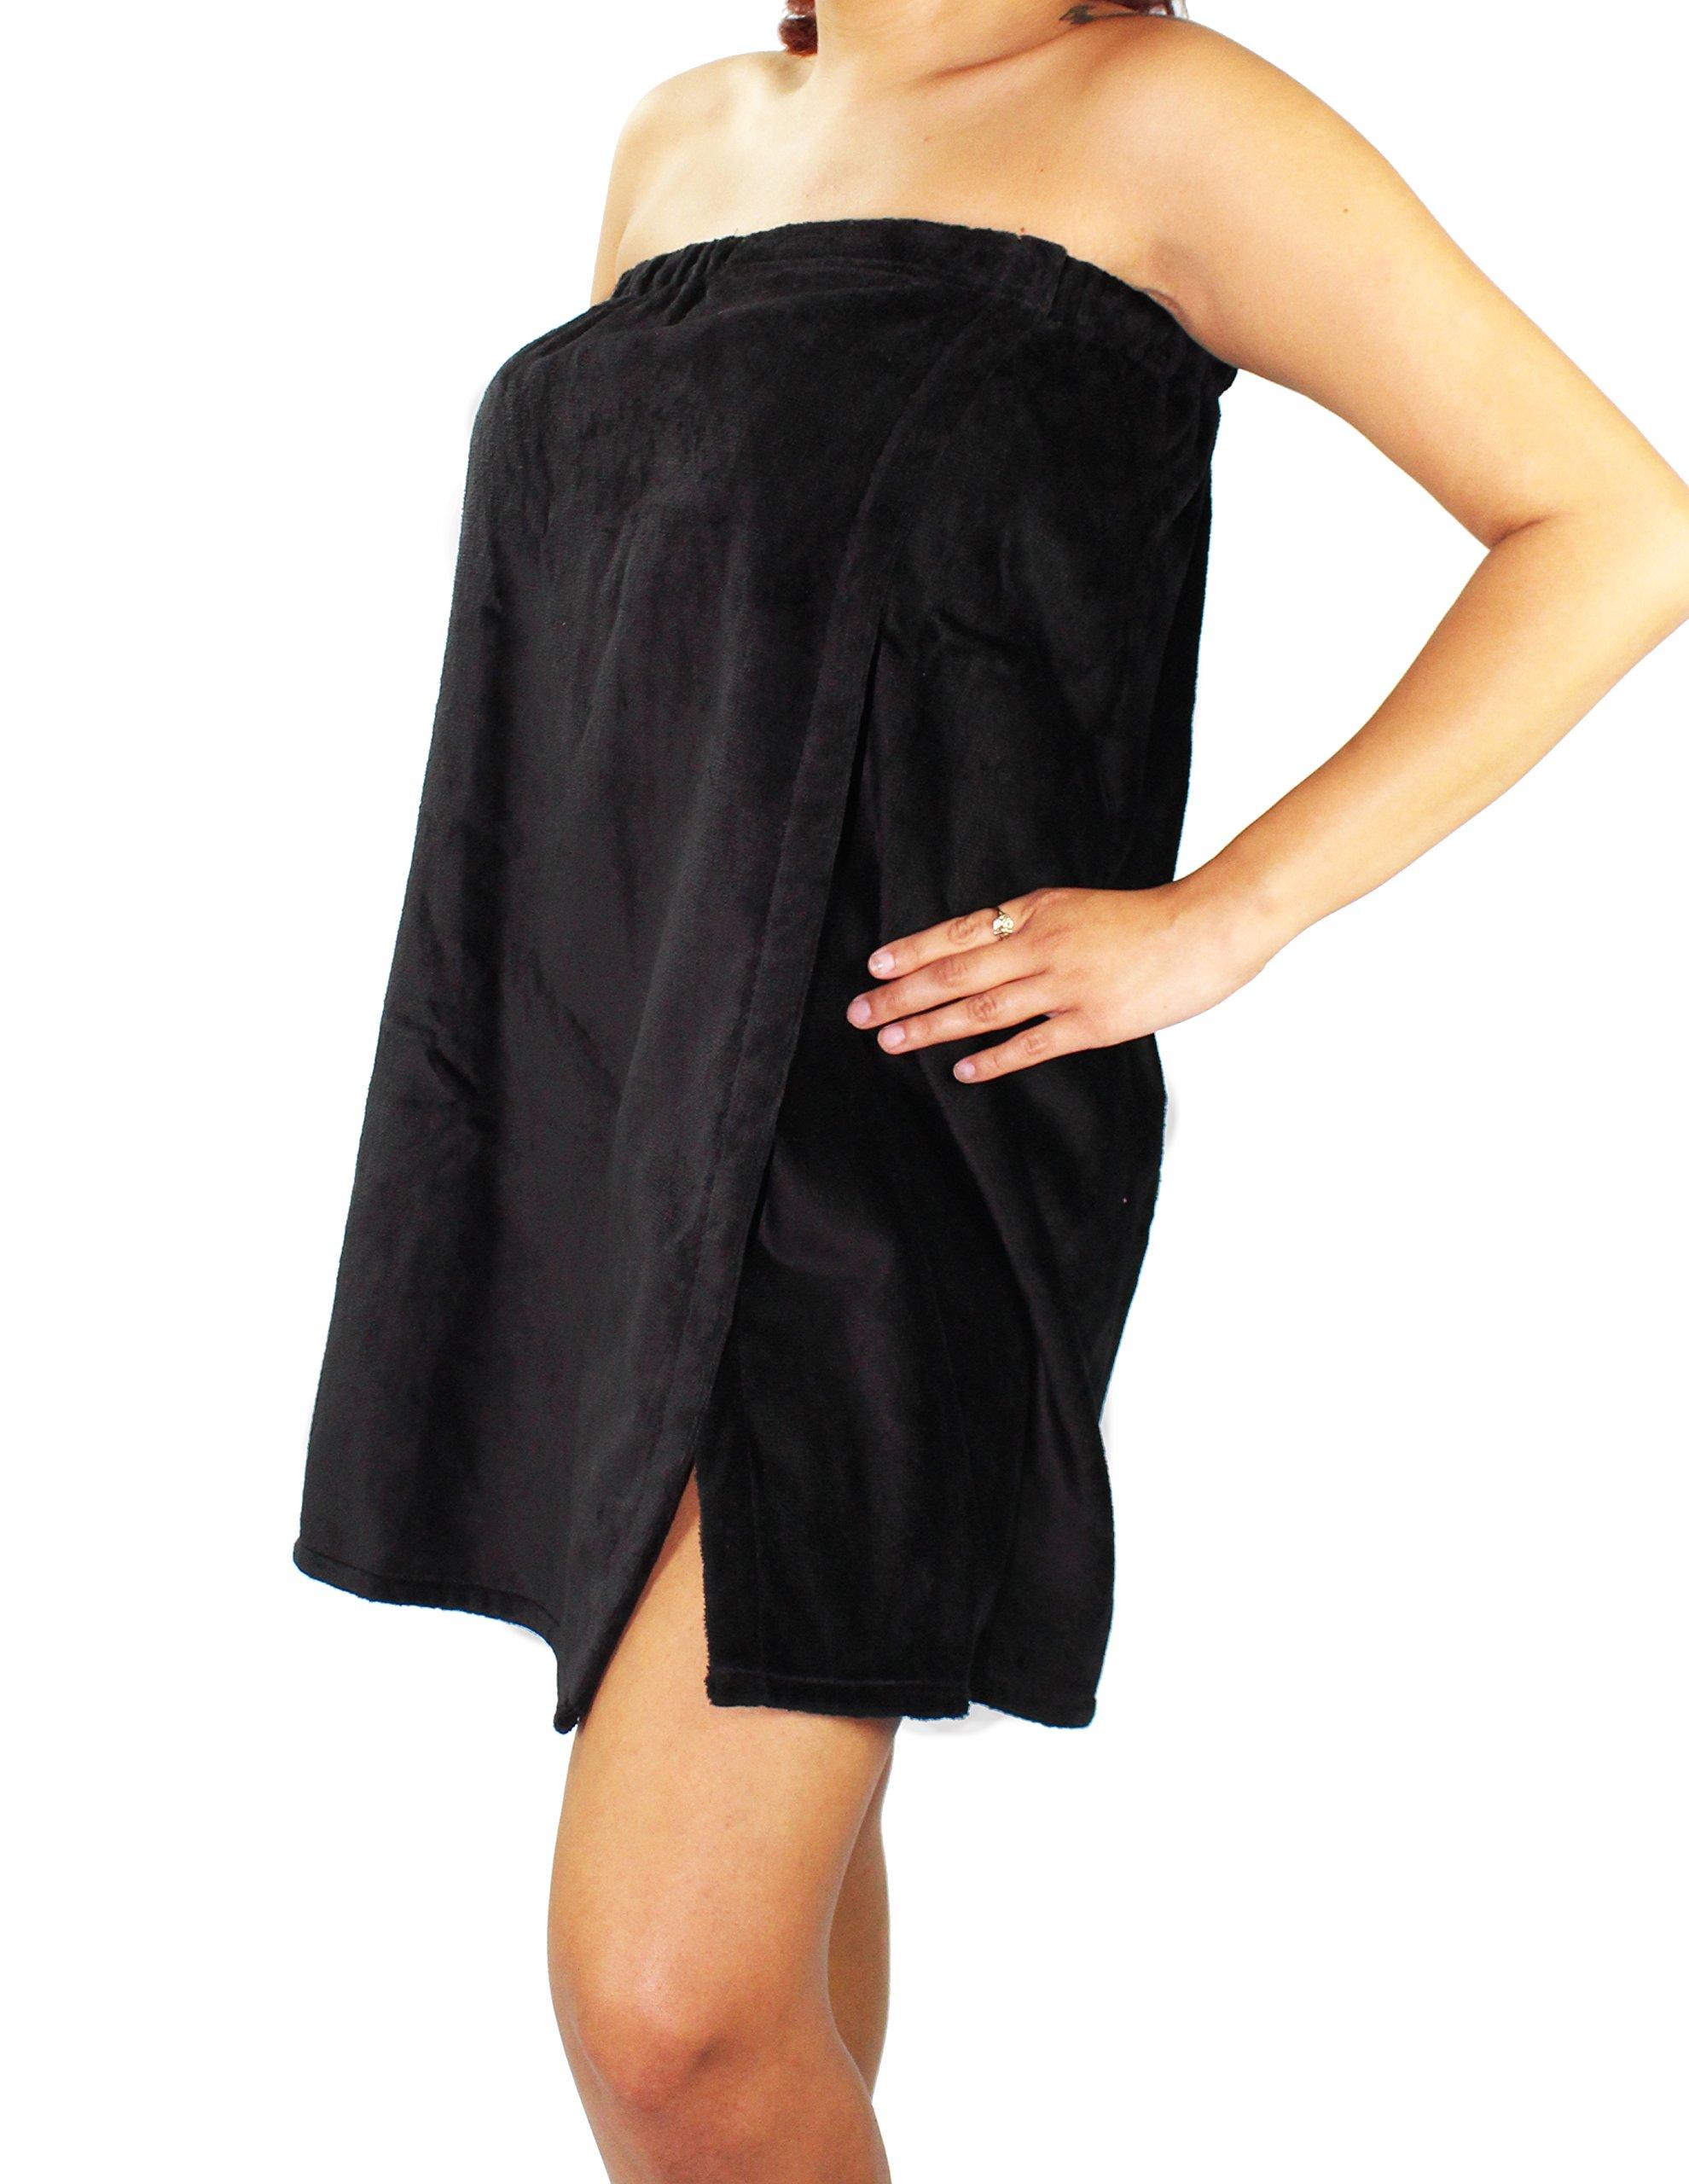 Sanders Classics 25'' Terry Towel Wrap - Black